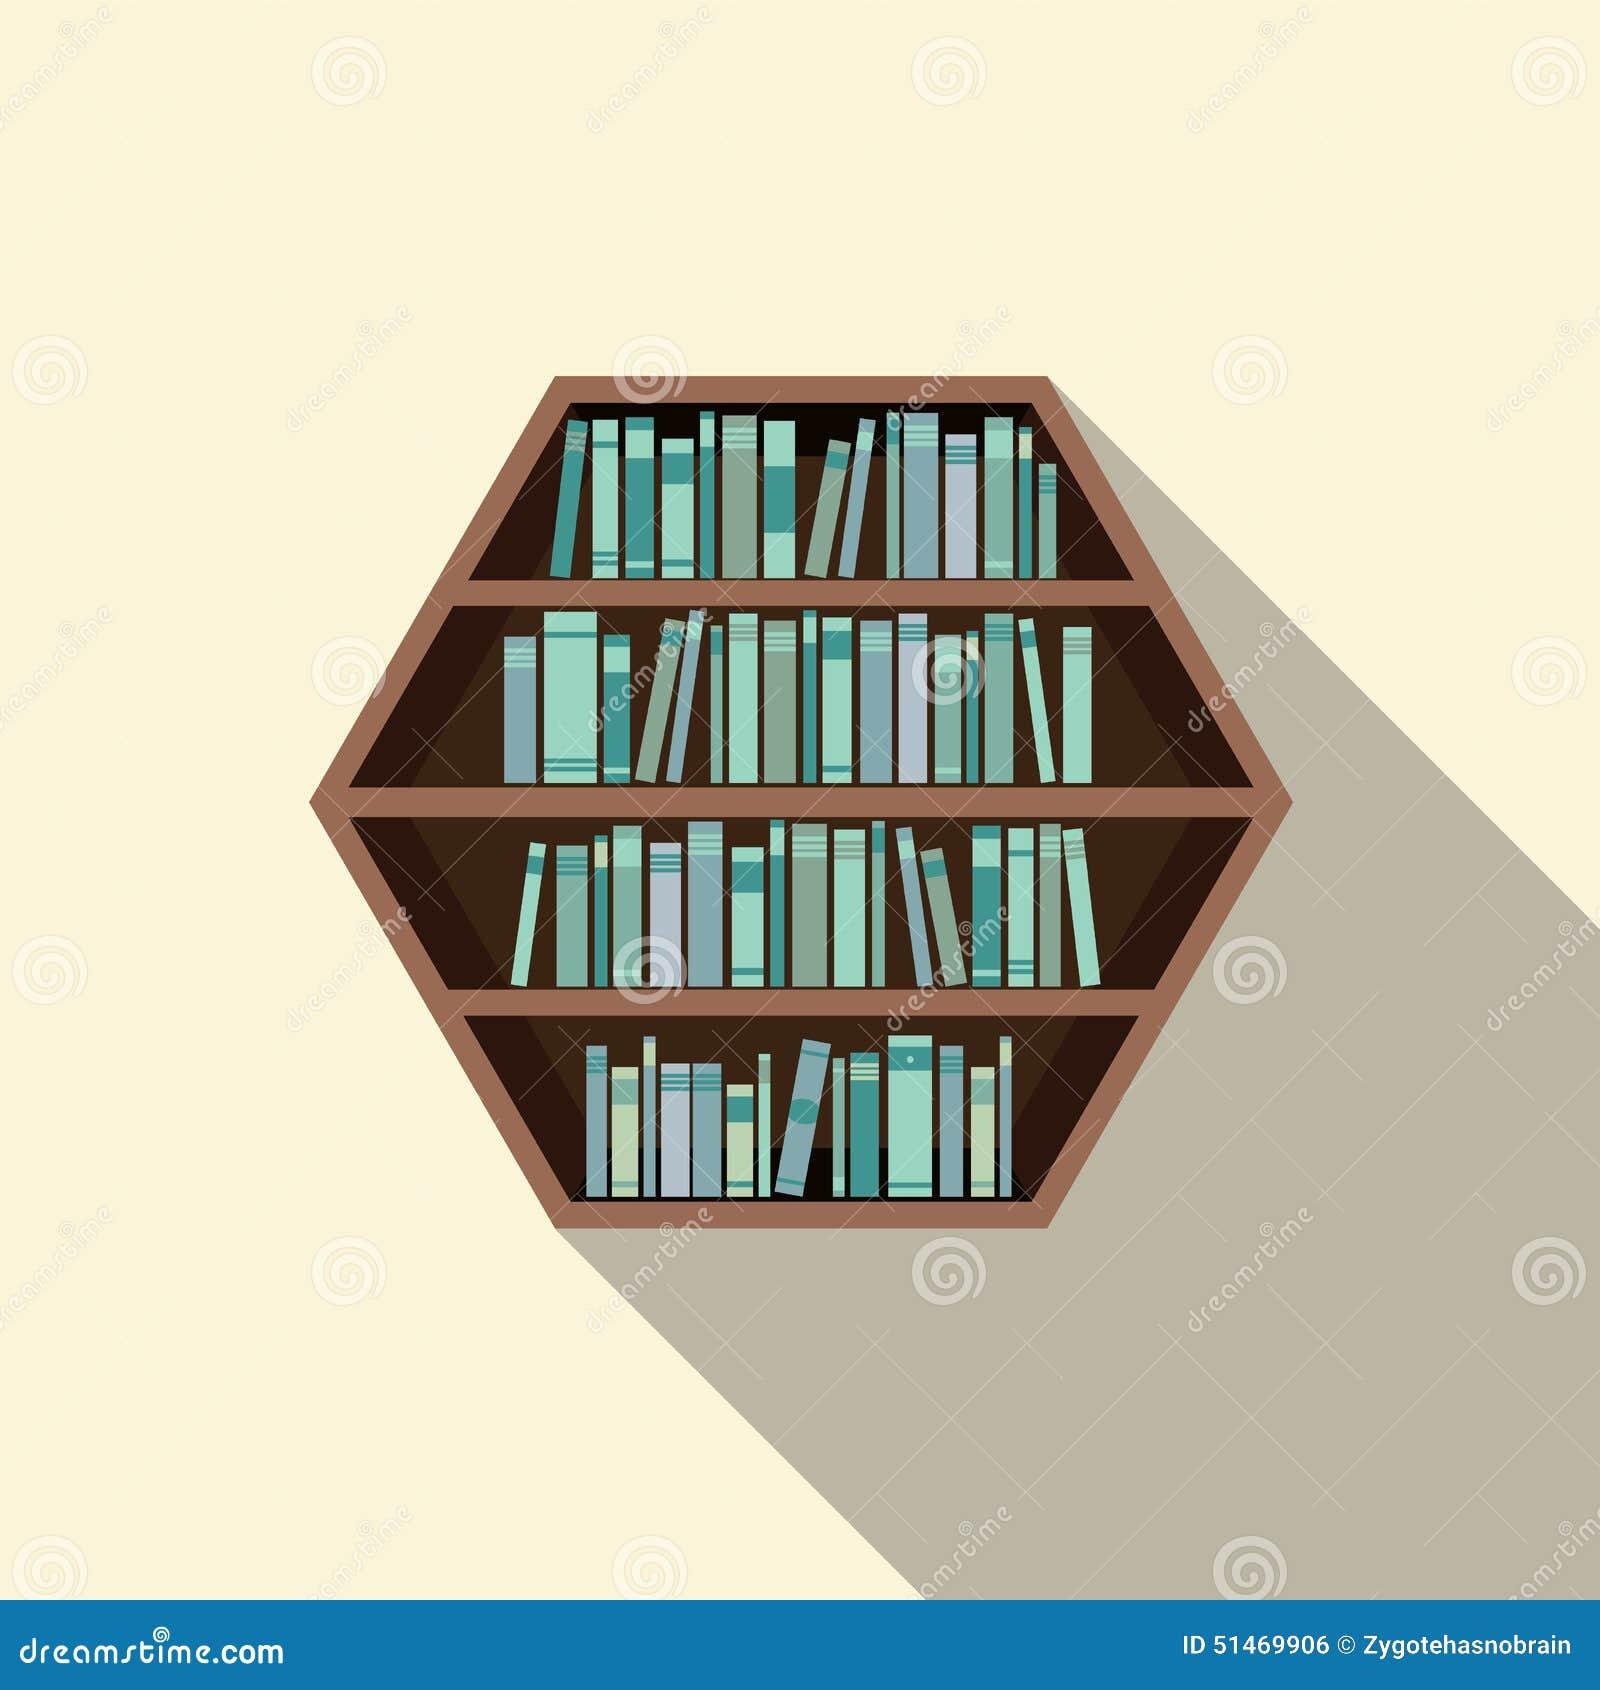 Bücherregal wand  Hexagon-Bücherregal Auf Wand Vektor Abbildung - Bild: 51469906